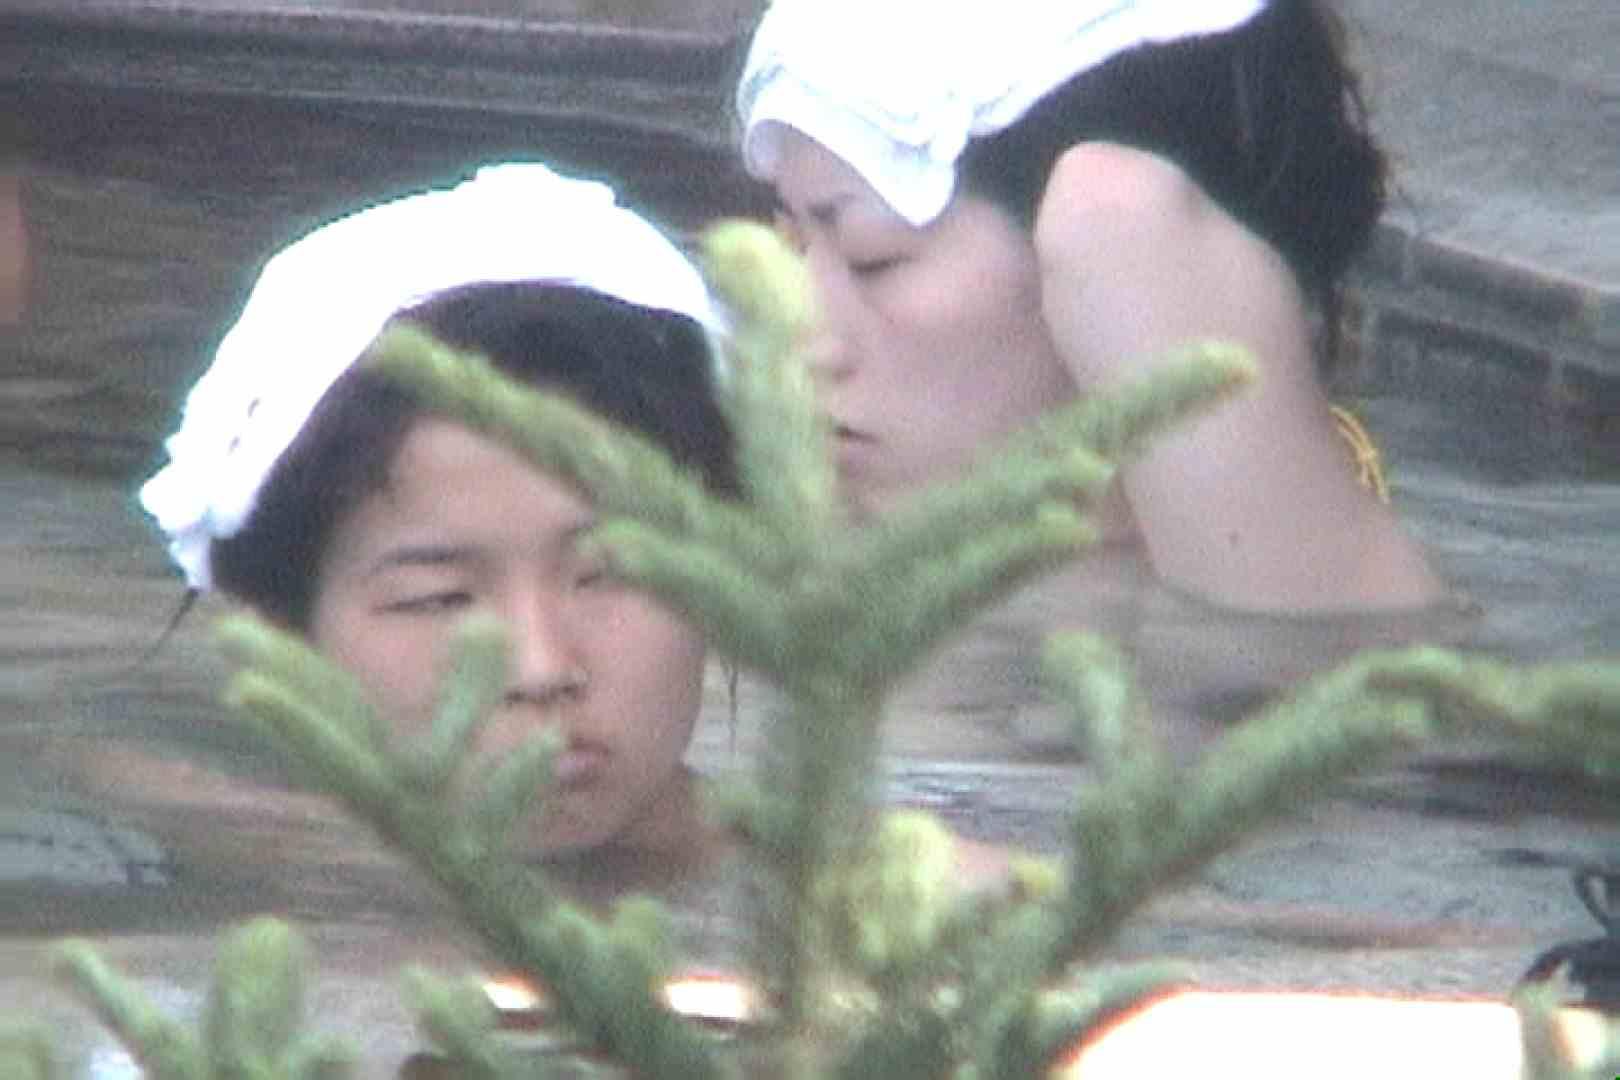 Aquaな露天風呂Vol.80【VIP限定】 盗撮 | HなOL  66pic 2